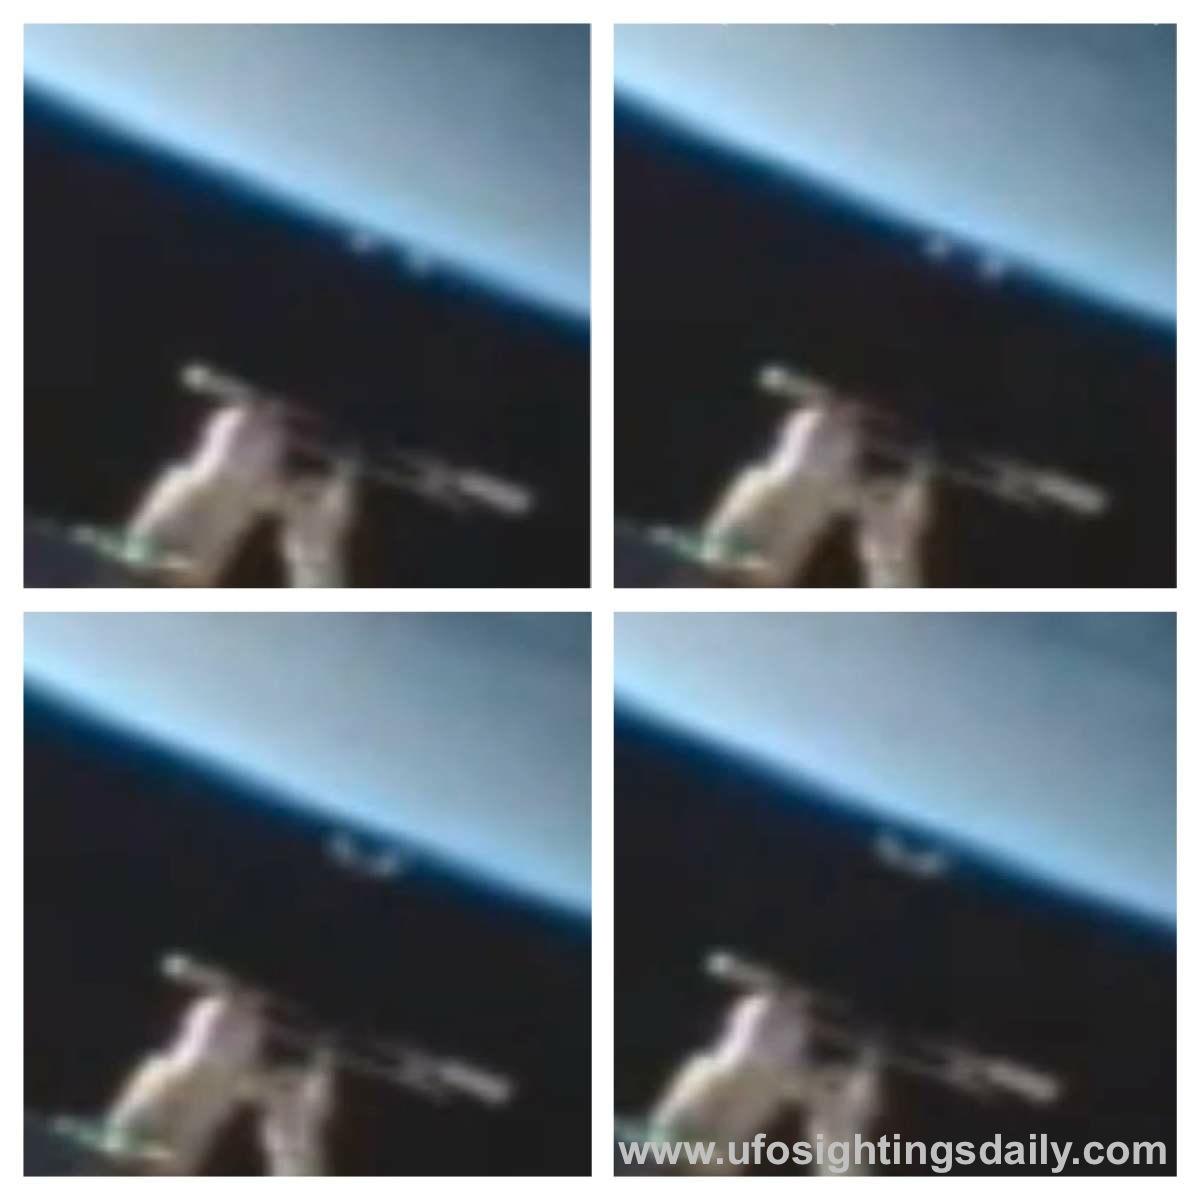 http://3.bp.blogspot.com/-A5ePM9Hi8KY/ULbnqtQHsGI/AAAAAAAALuk/JulItJx54iw/s1600/UFO,%2BUFOs,%2Bsighting,%2Bsightings,_NASA,%2Bspace,%2Bastronomy,%2BAngelina%2BJolie,%2BISS,%2BInternational,%2Bstation,%2Bnews,%2Bnov,%2B2012,%2Bastronaut,%2Bmayan,%2Bprediction.jpg